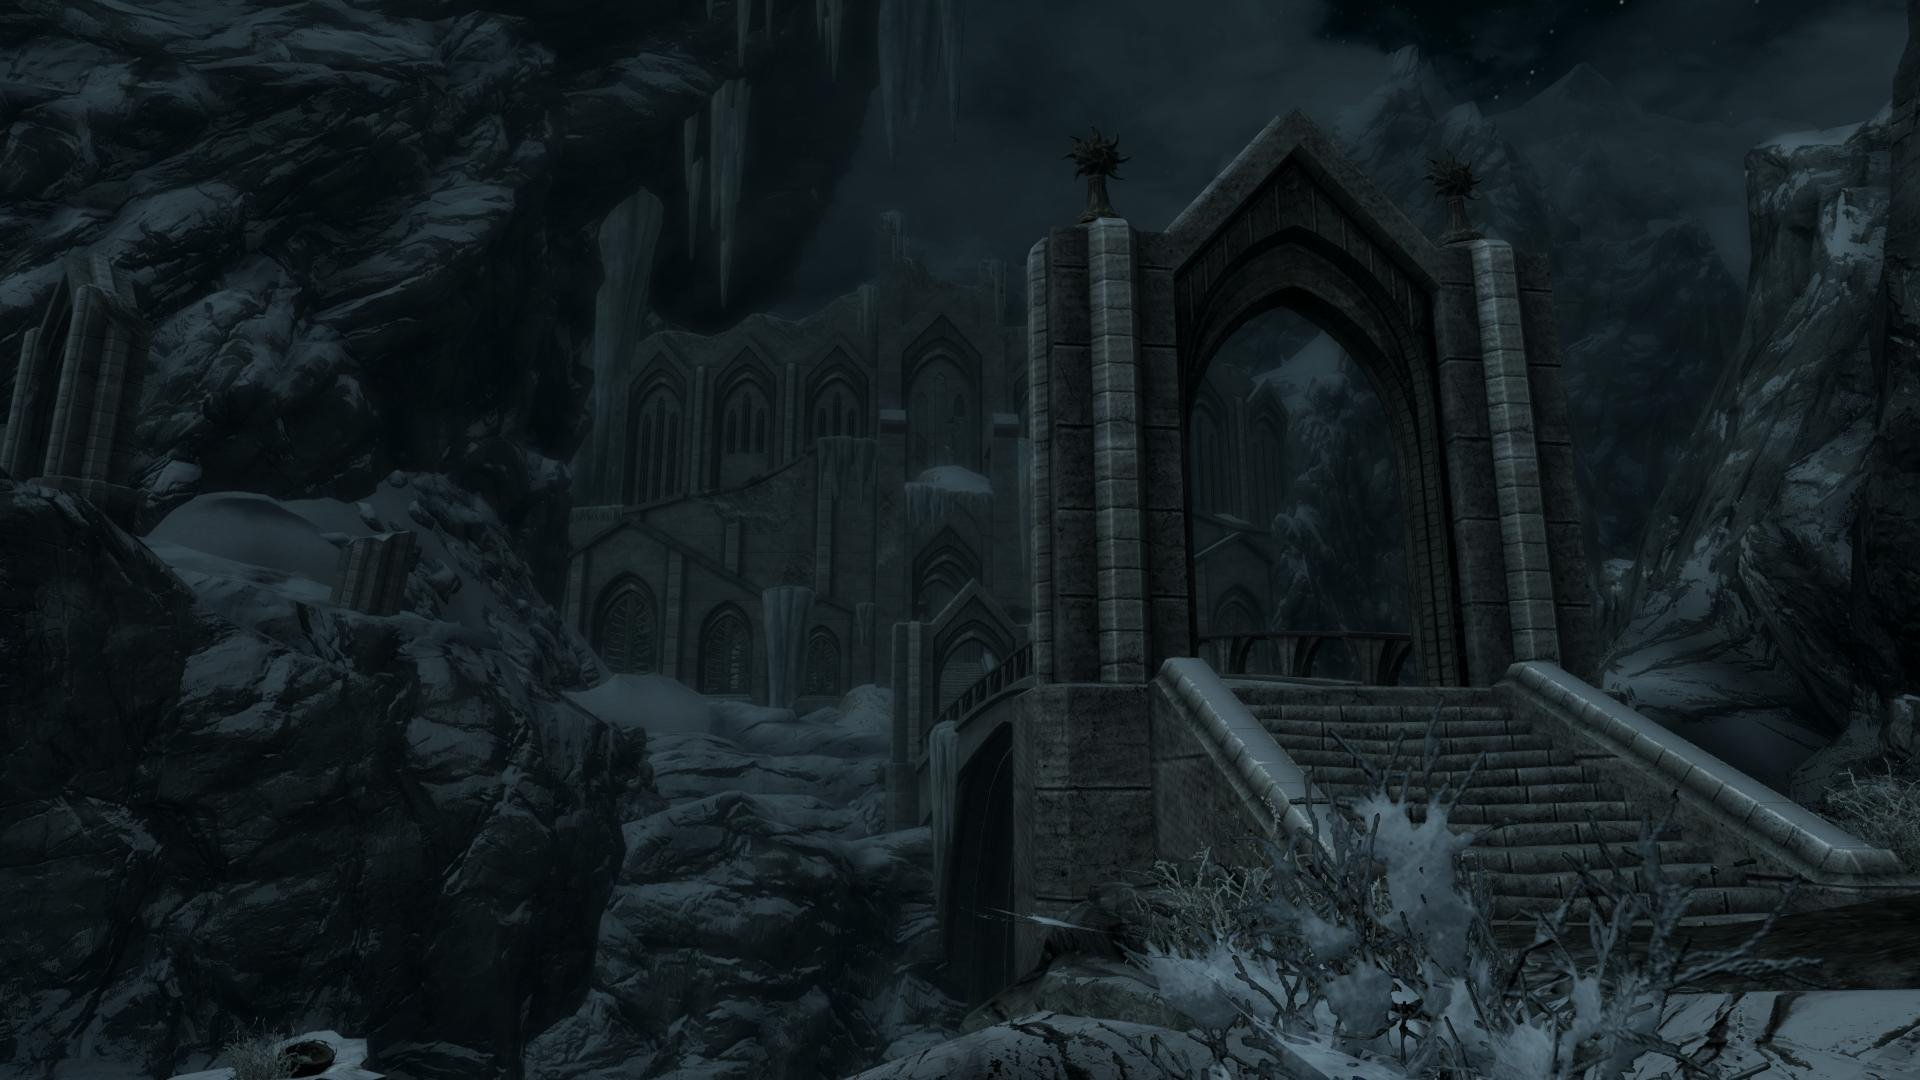 skyrim vampire wallpaper - photo #15